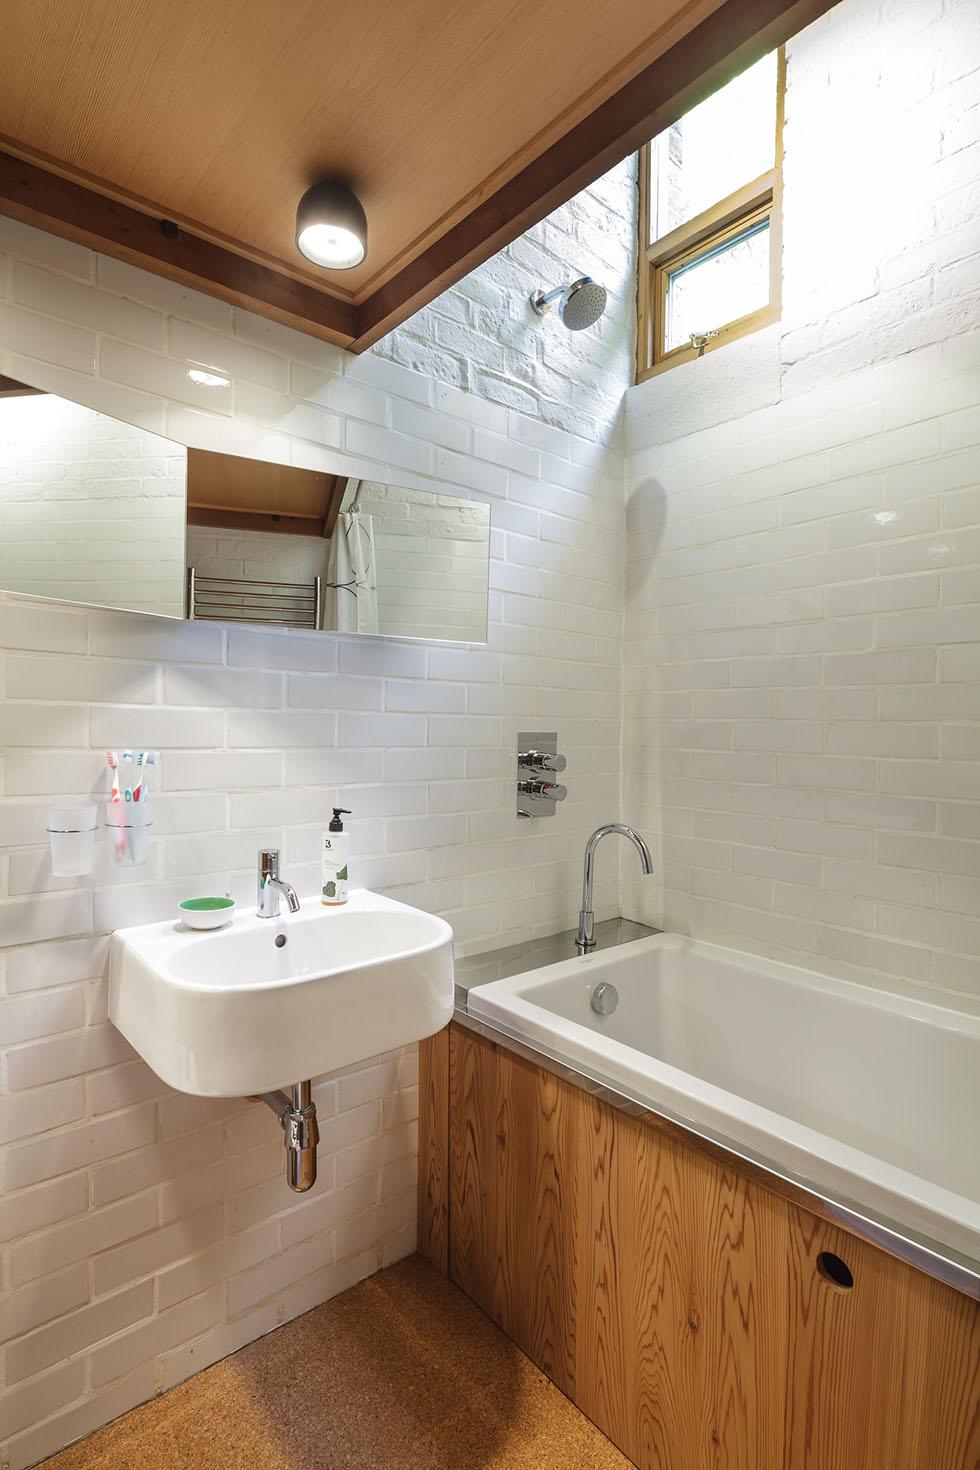 Coppin-salisbury-remodel-bathroom